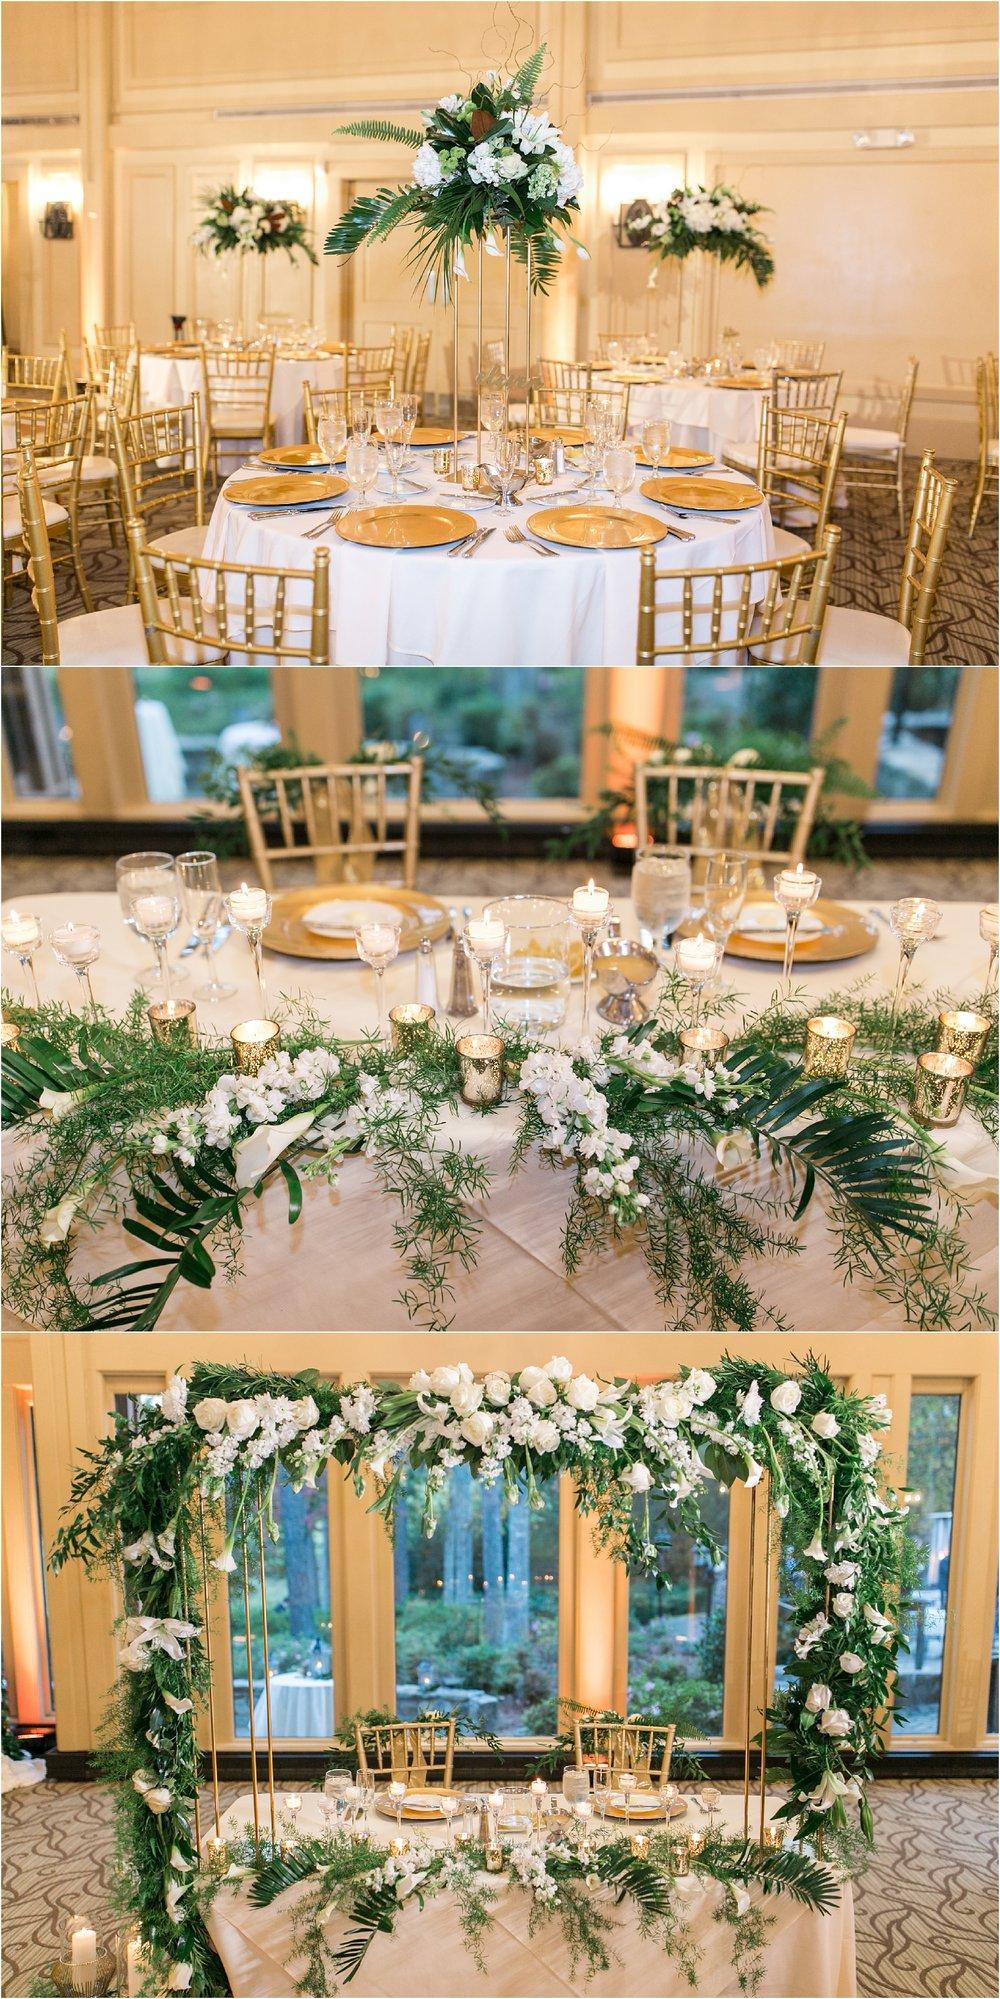 Savannah Eve Photography- Bottiglion-Scope Wedding- Sneak Peek-62.jpg